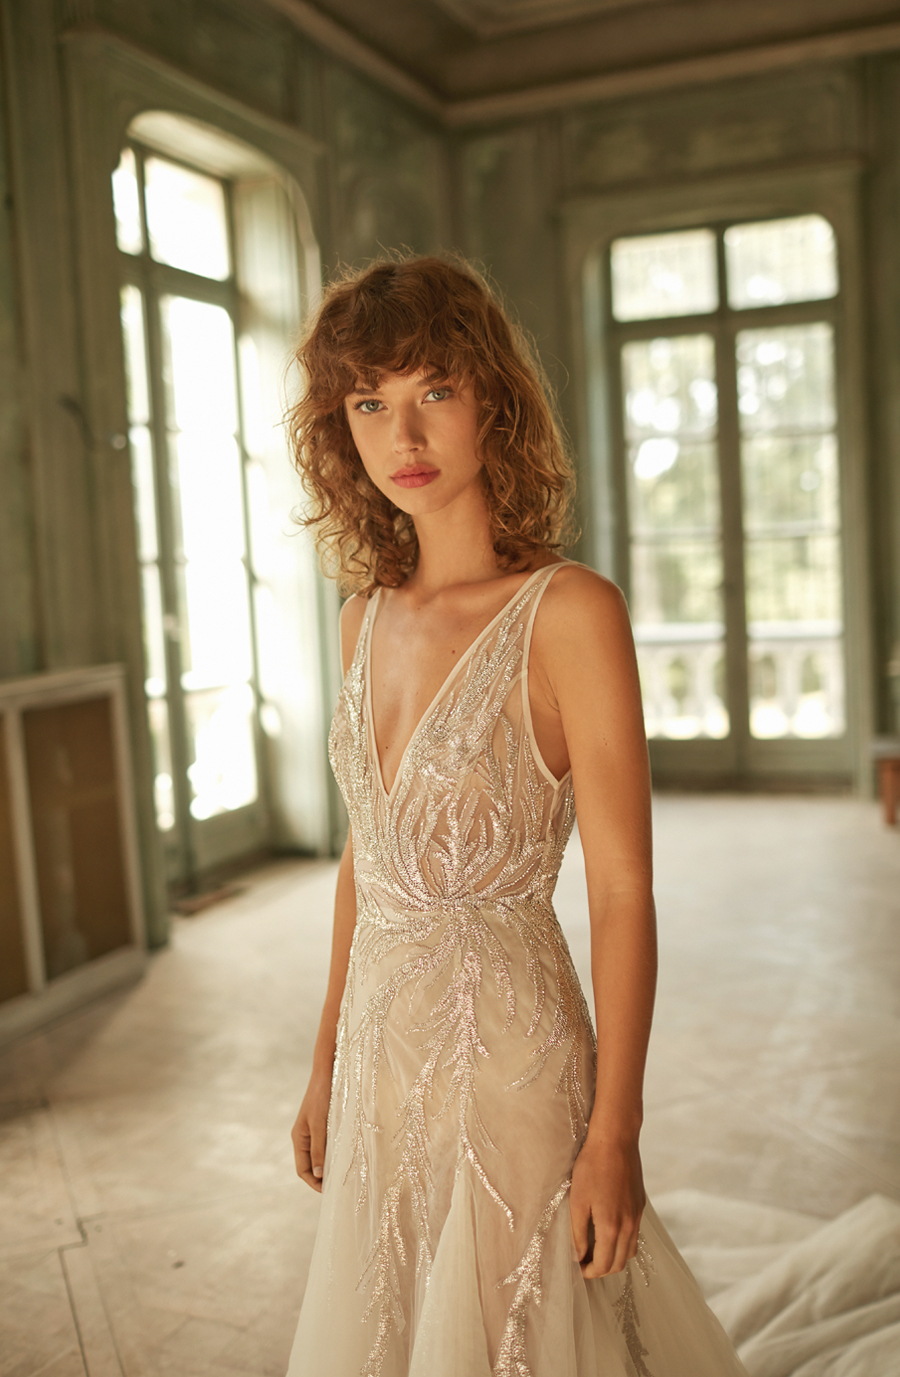 camille dress photo